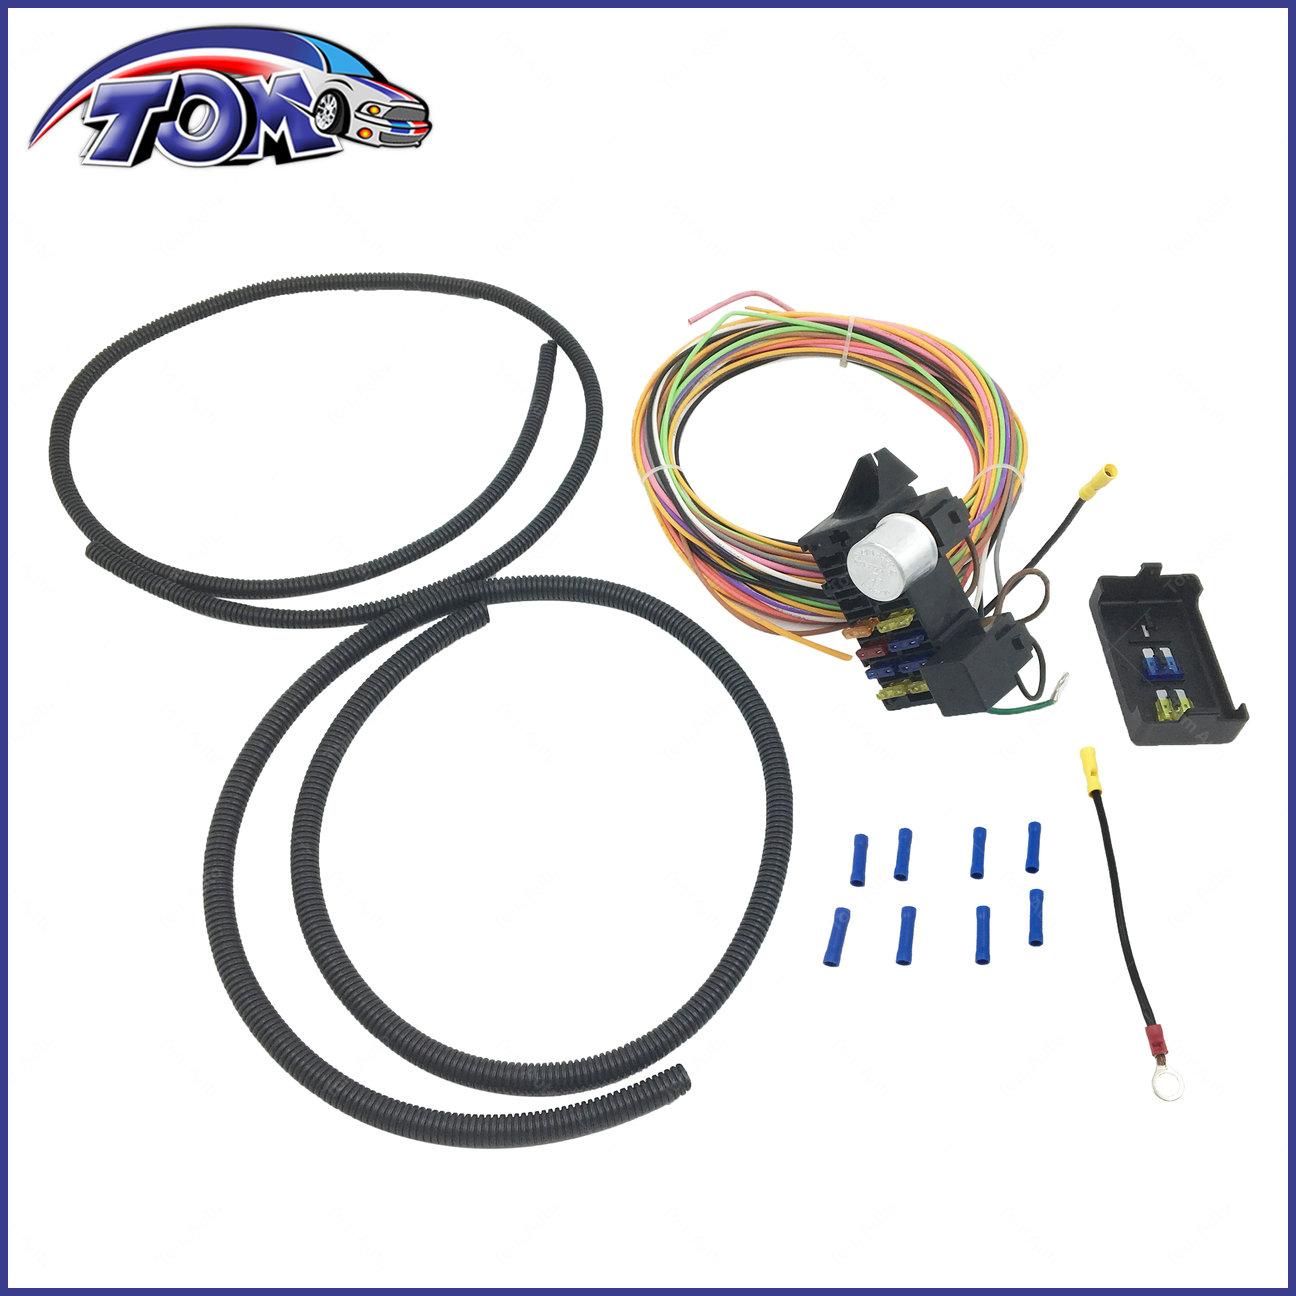 10 CIRCUIT BASIC WIRE HARNESS FUSE BOX STREET HOT RAT ROD WIRING CAR TRUCK  12V